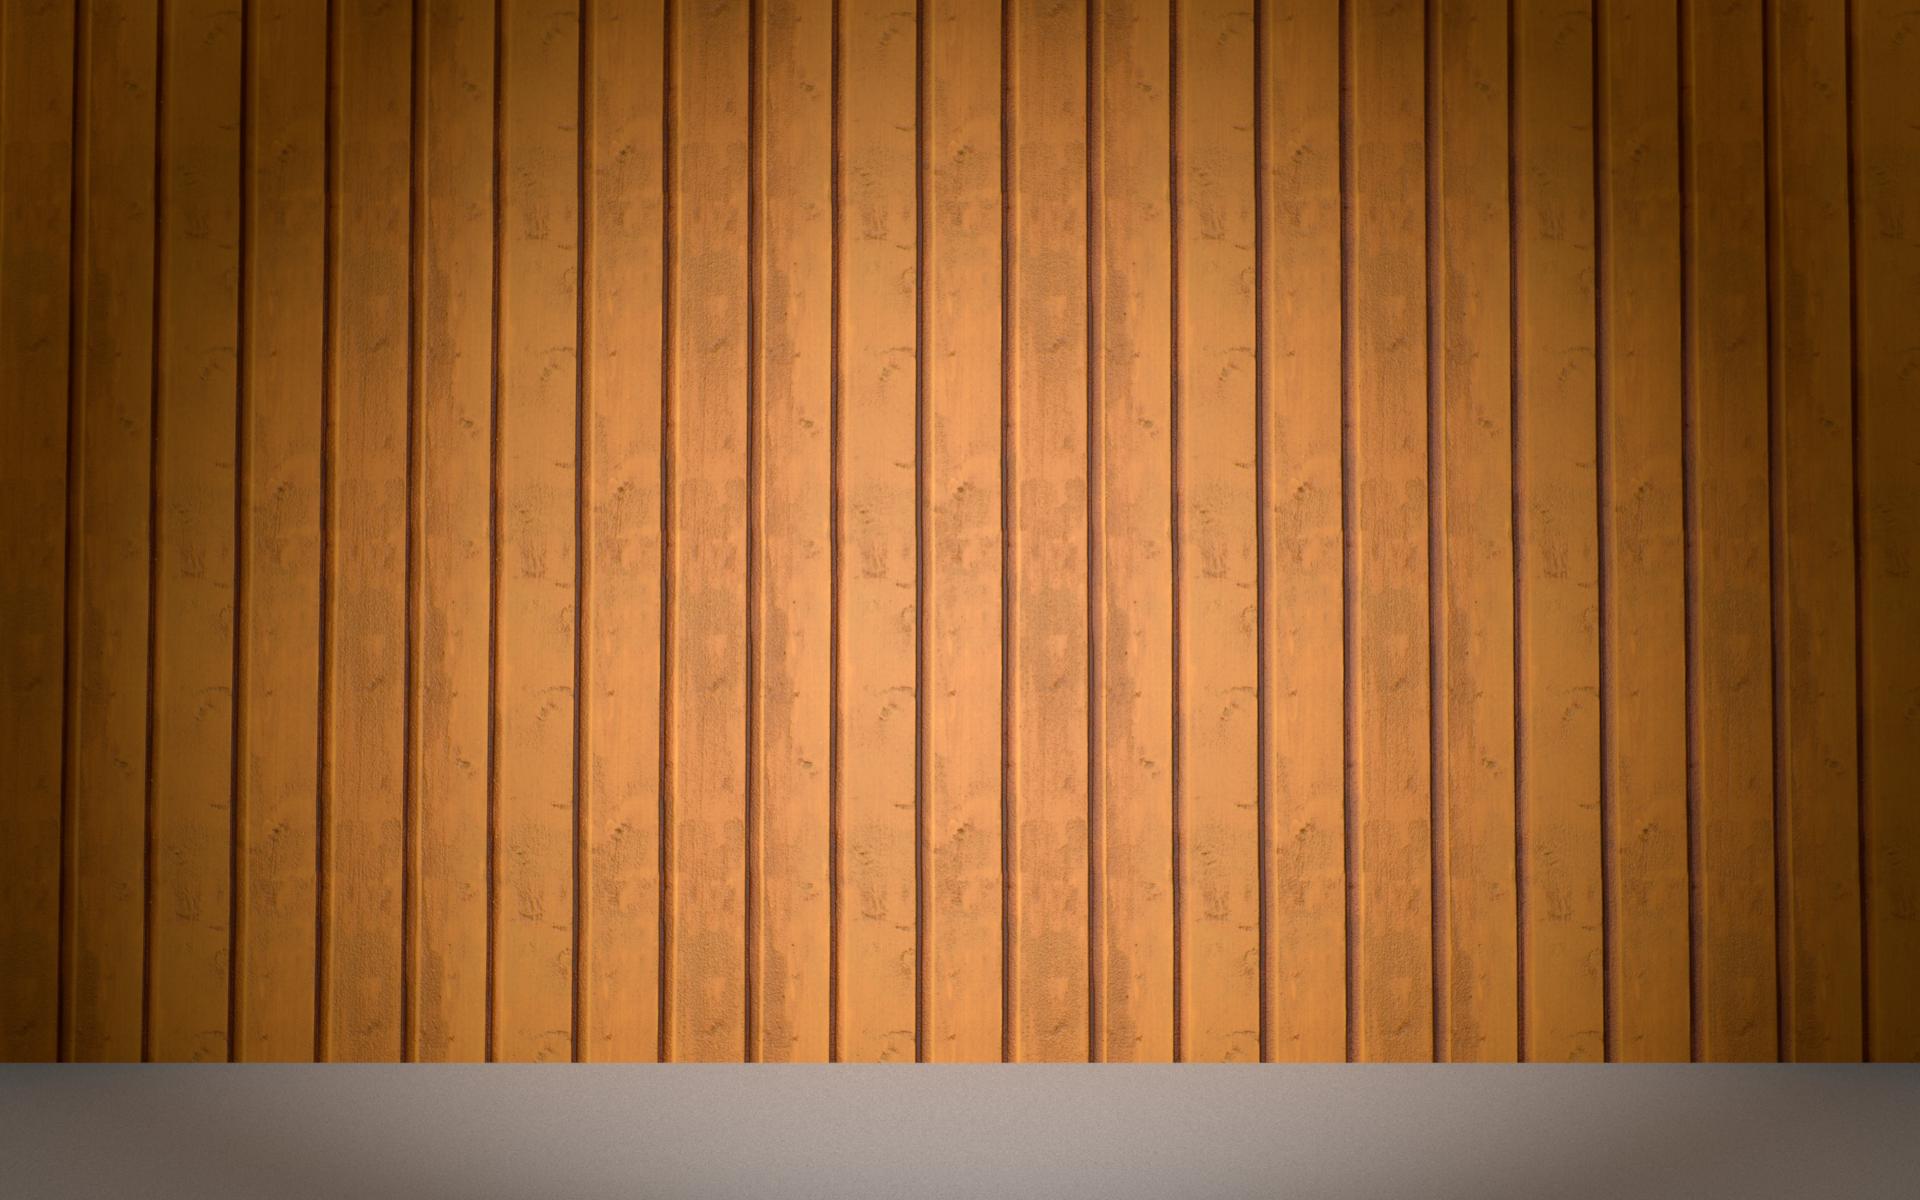 Wood clipart wood wall Wall – Wood Wood Art